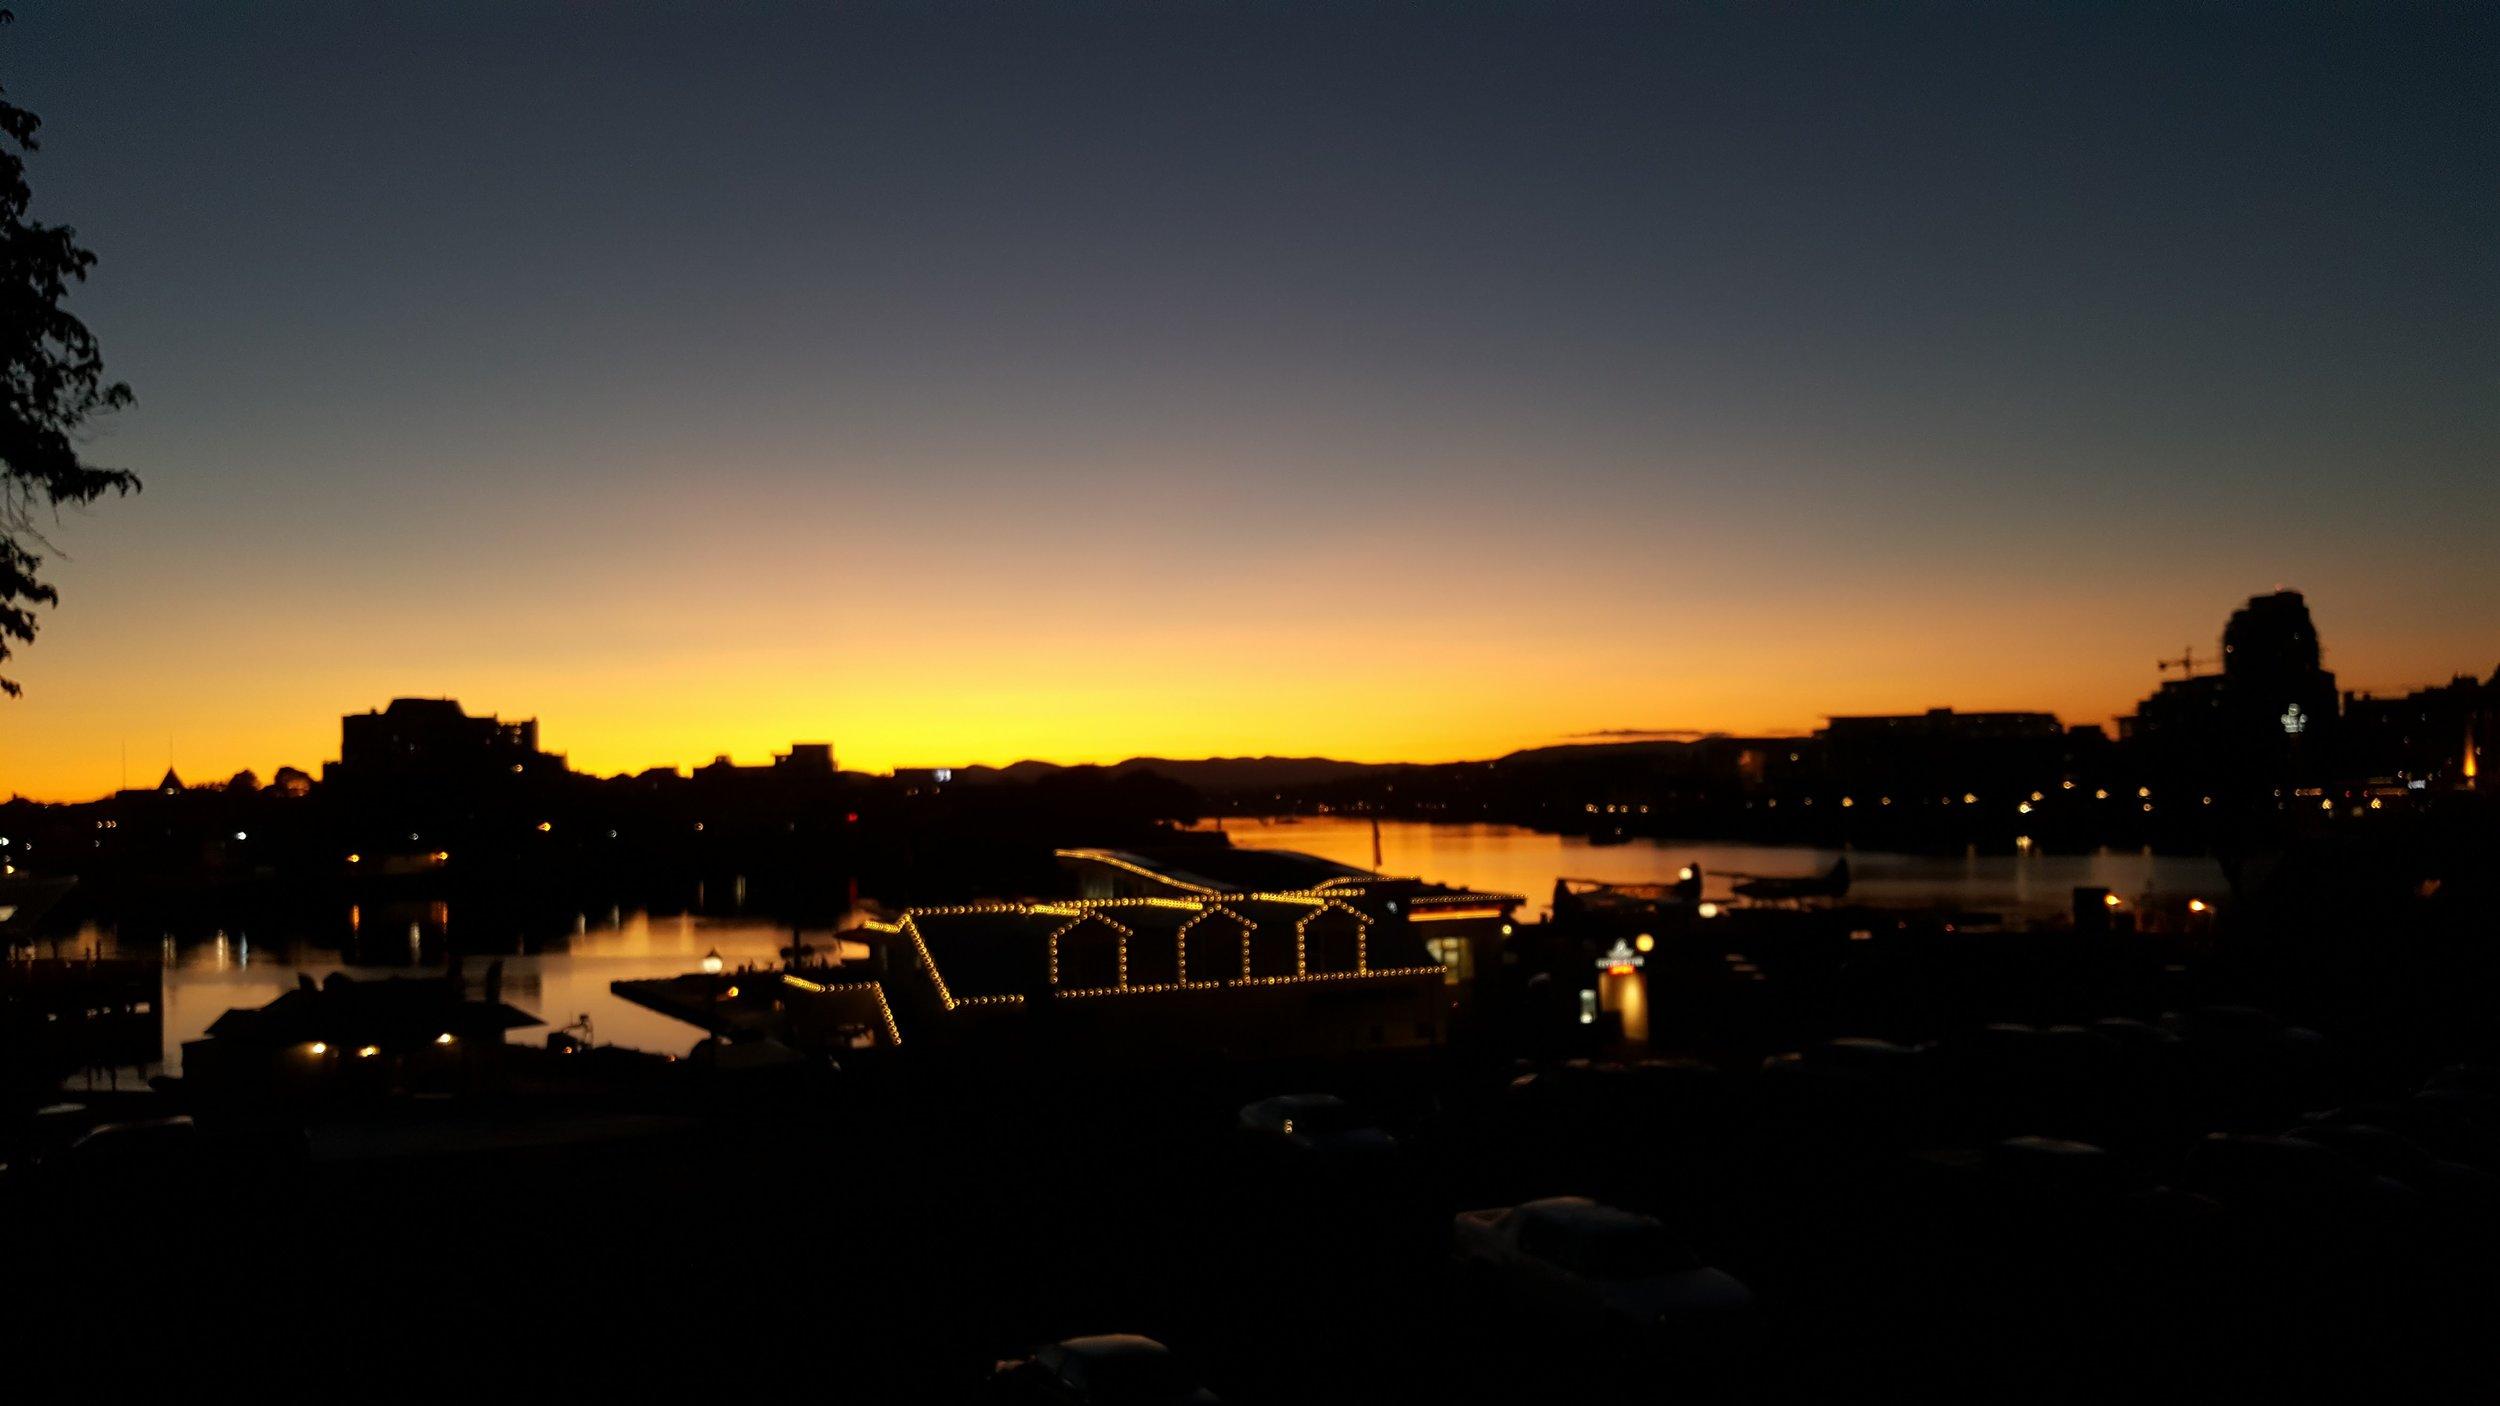 Solitary stroll along the Inner Harbour at sunset